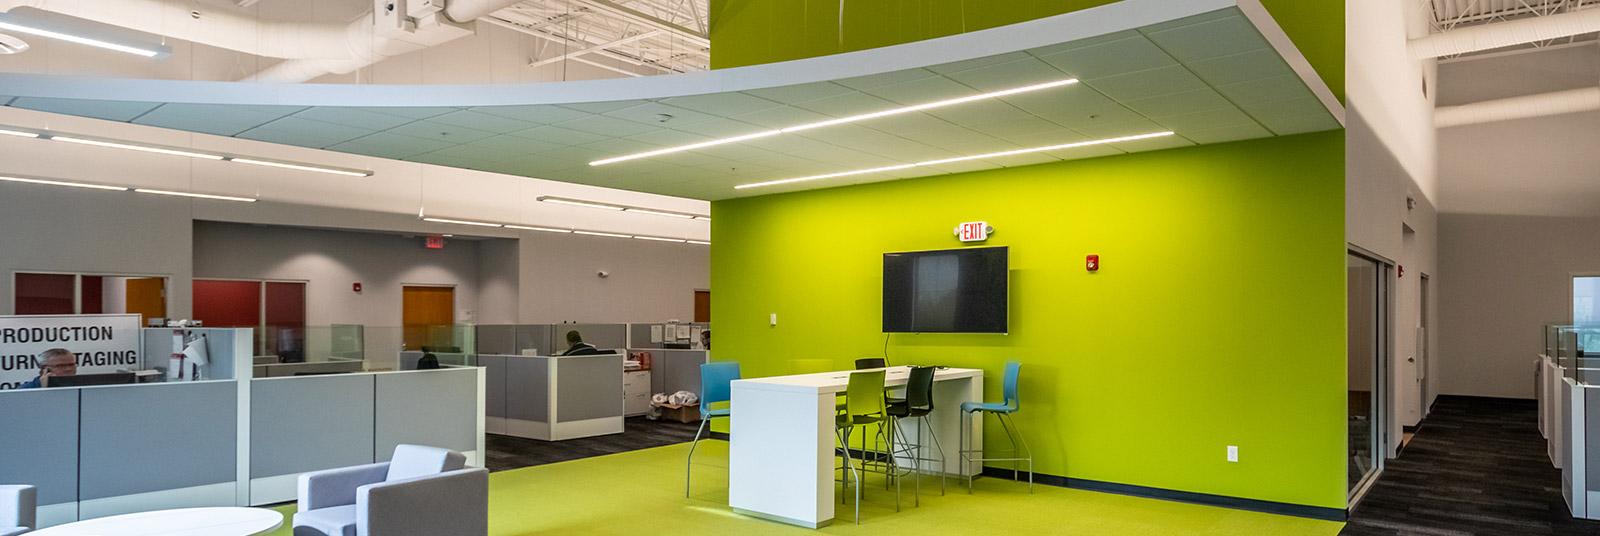 Second floor office space inside the Nehemiah Manufacturing facility in Cincinnati, Ohio.